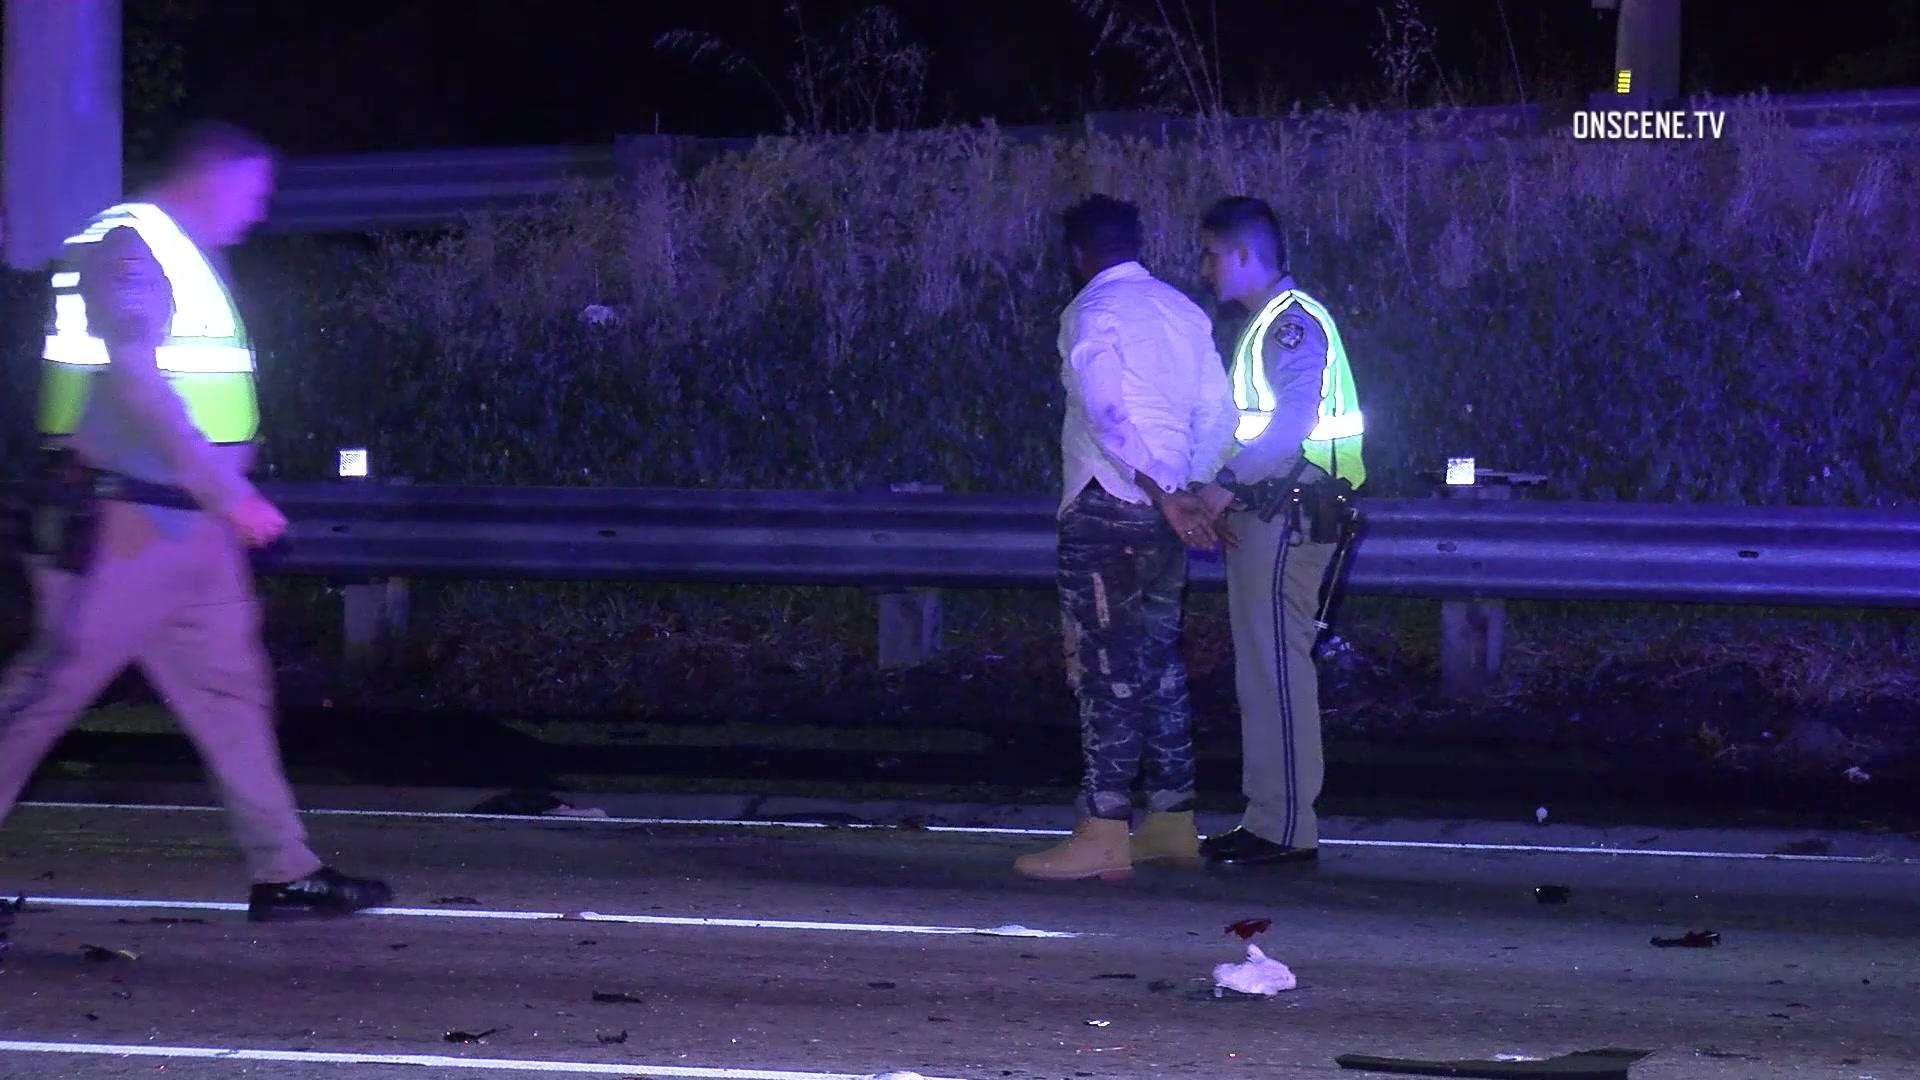 405 Freeway Deadly Nightmare Drunken Drivers Horrific